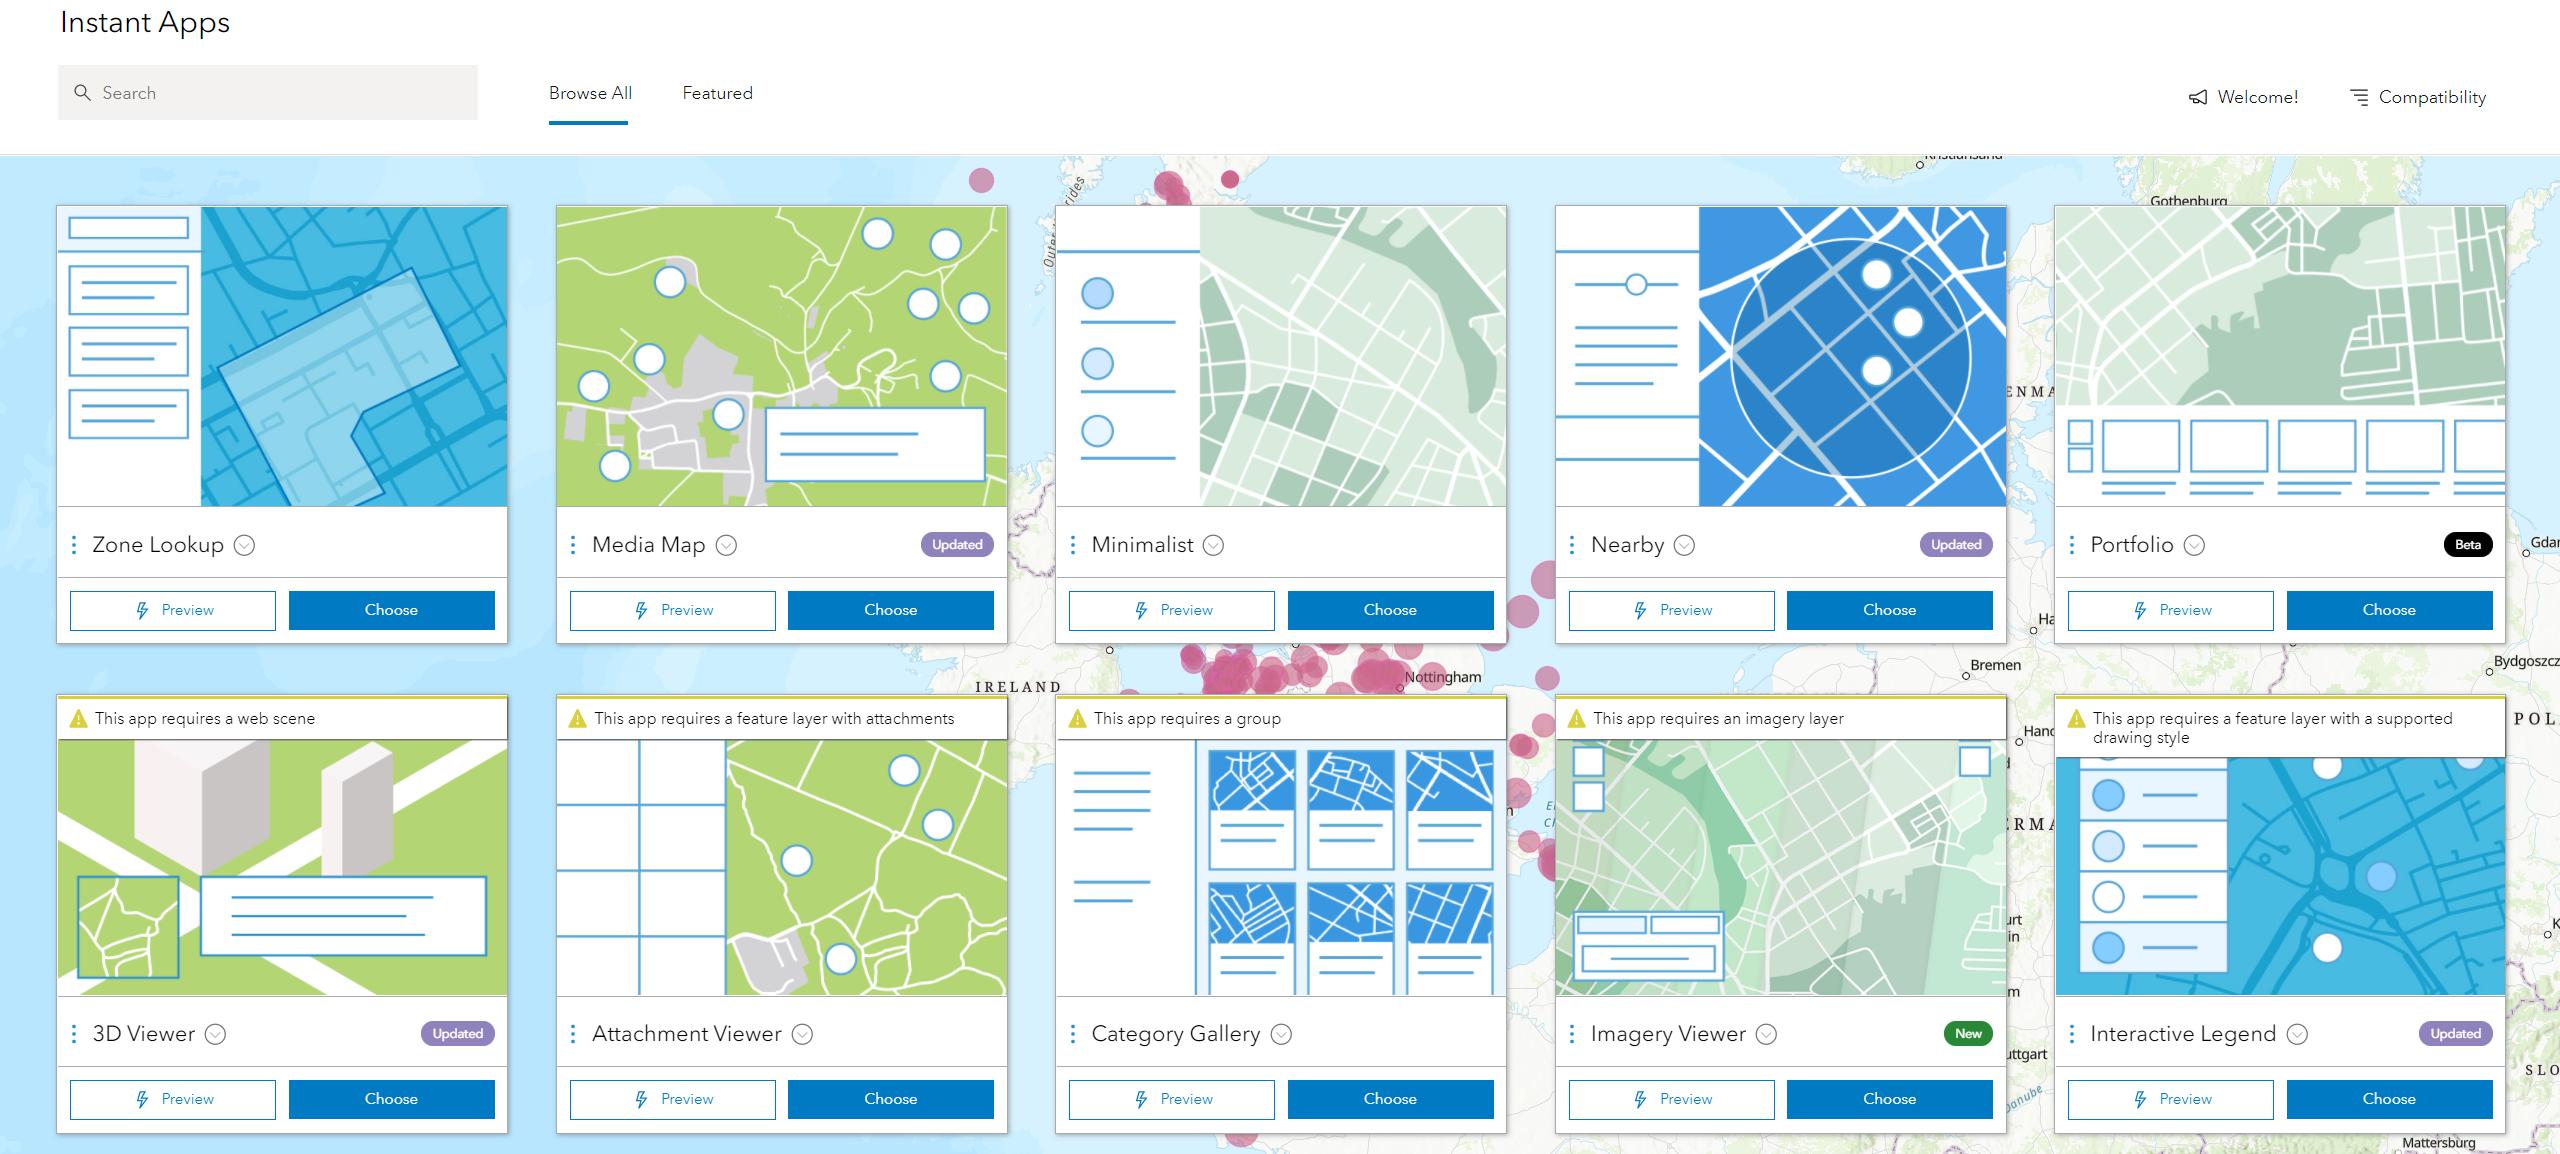 ArcGIS Online Instant Apps